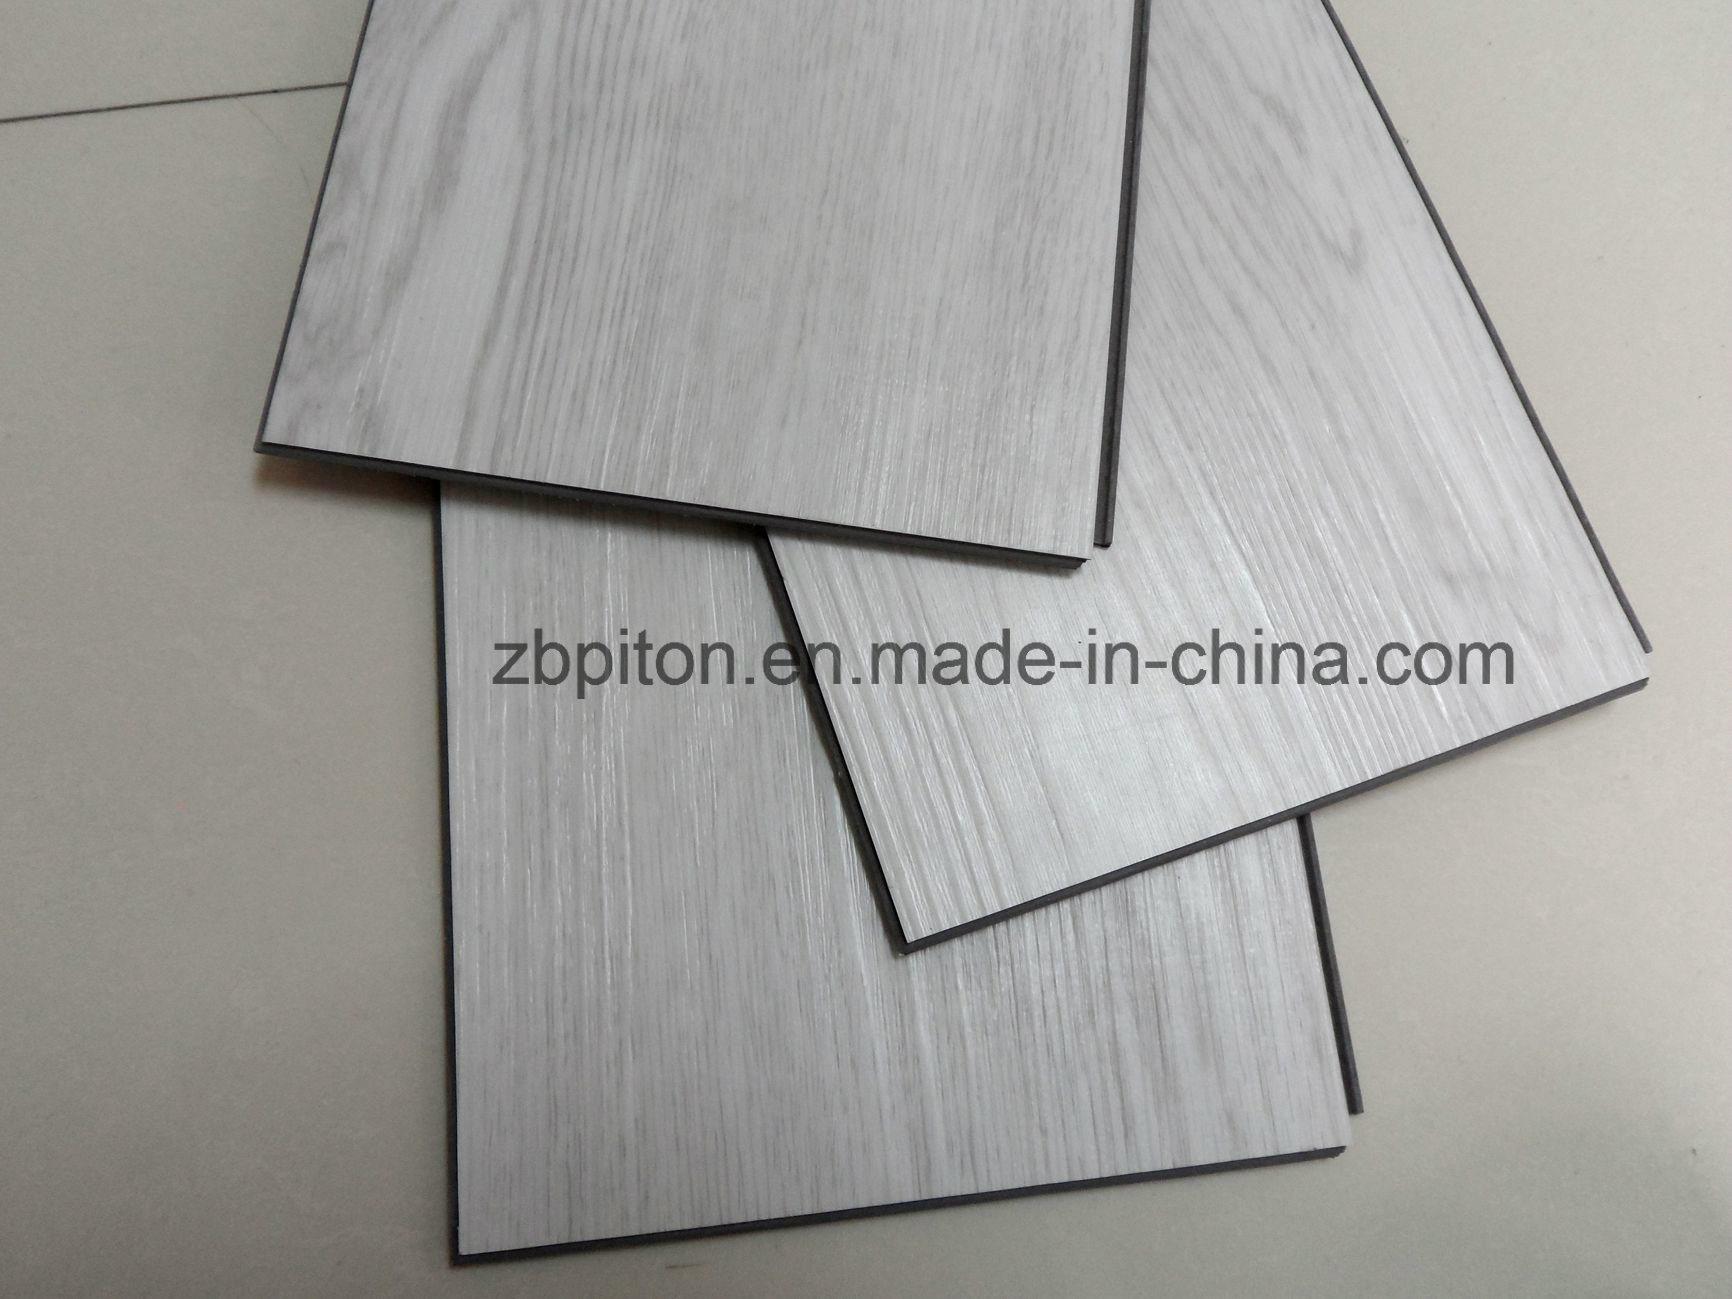 China Interlocking Plastic Floor Tile Lvt Pvc Vinyl Planks Cng0471n